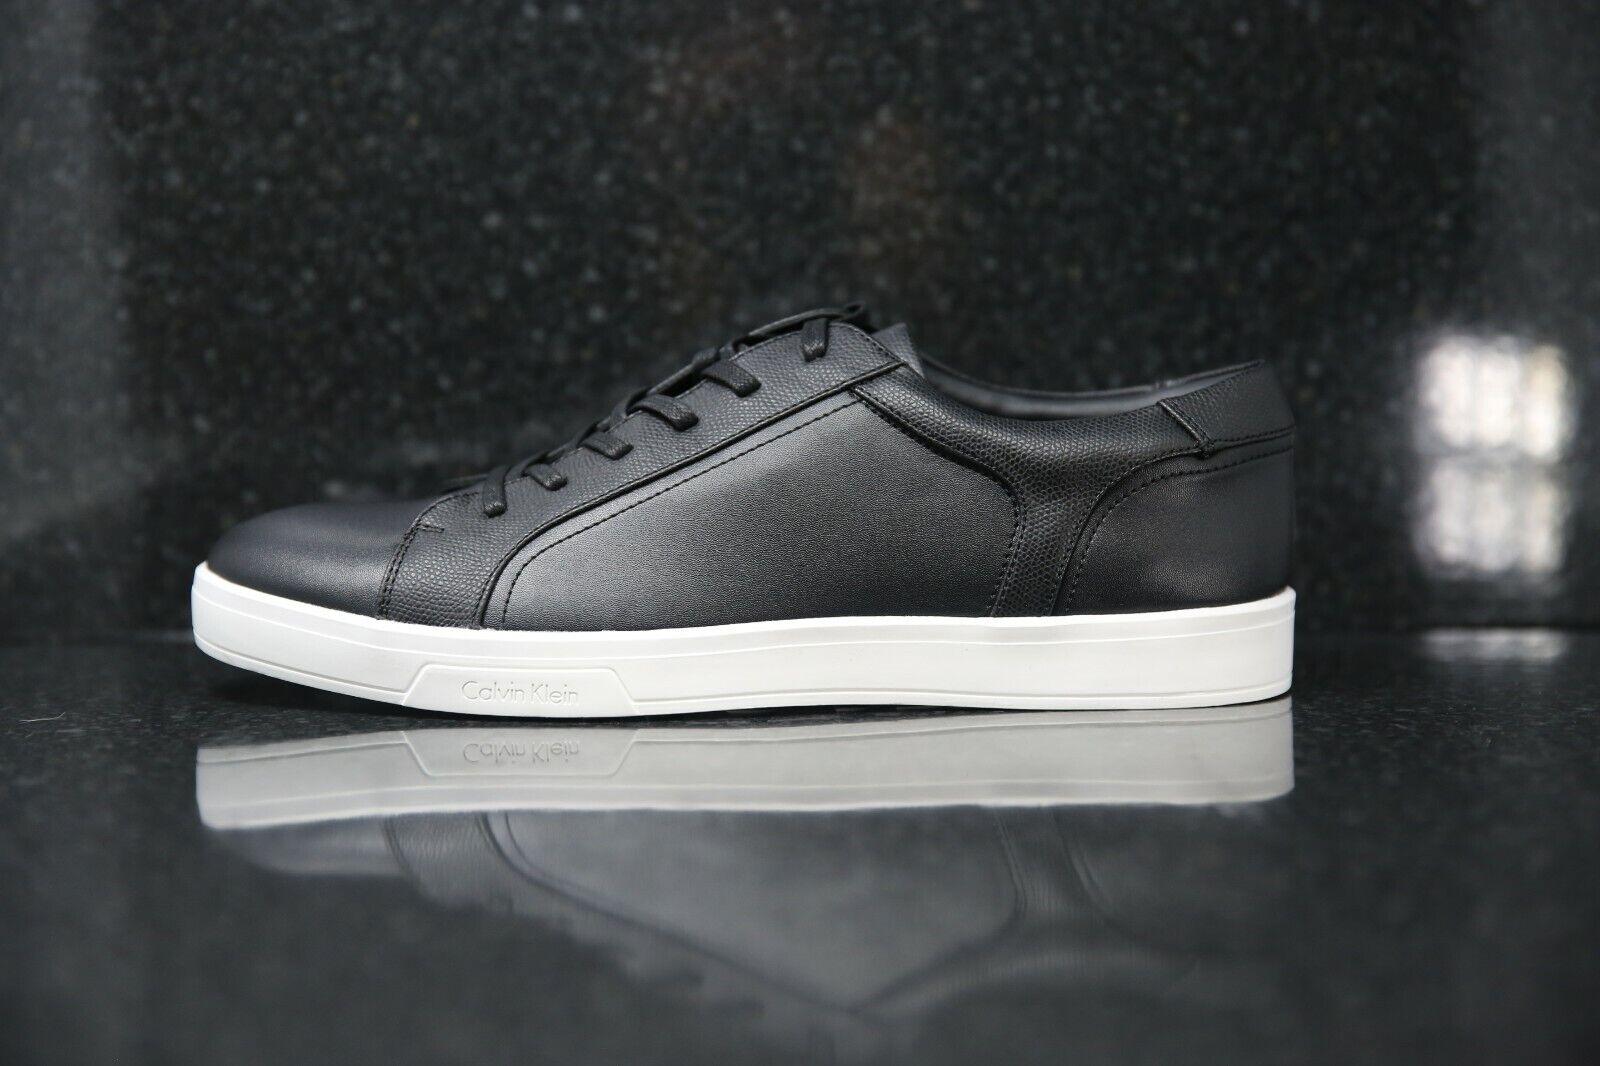 Calvin Klein Barwan Lace Up Men Shoes Black Size UK 11 EUR 45